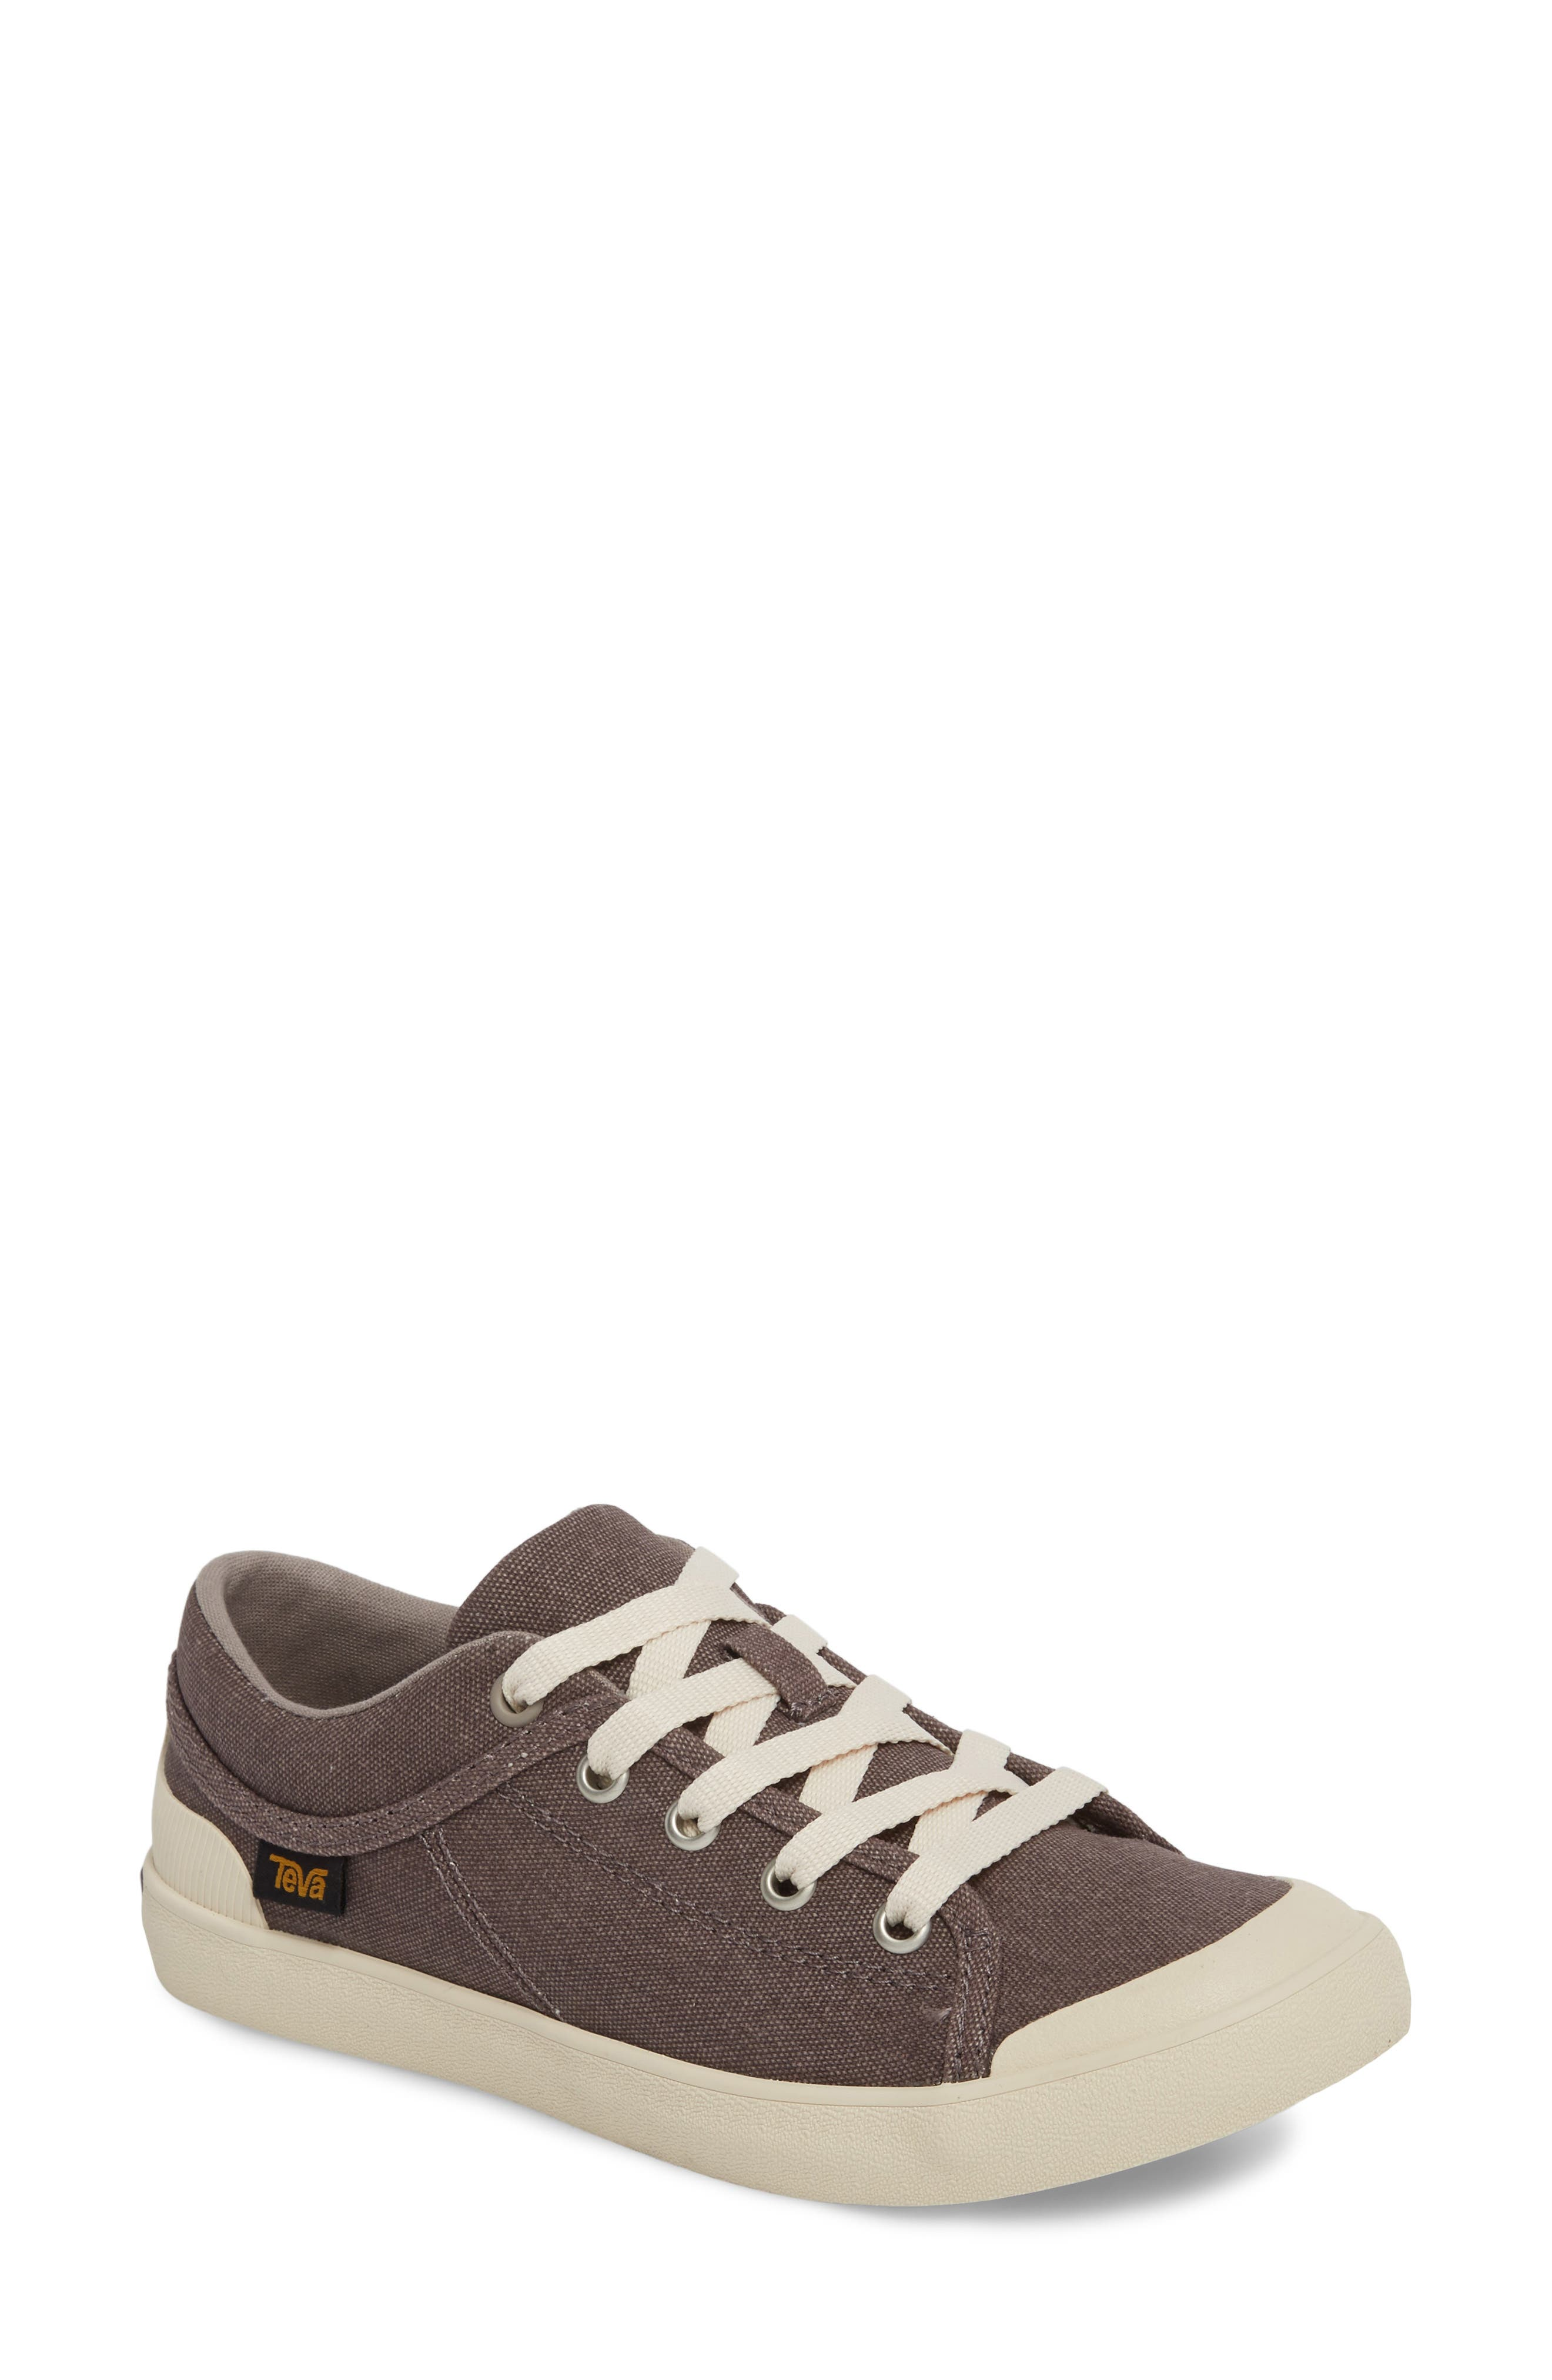 'Freewheel' Sneaker,                         Main,                         color, Plum Truffle